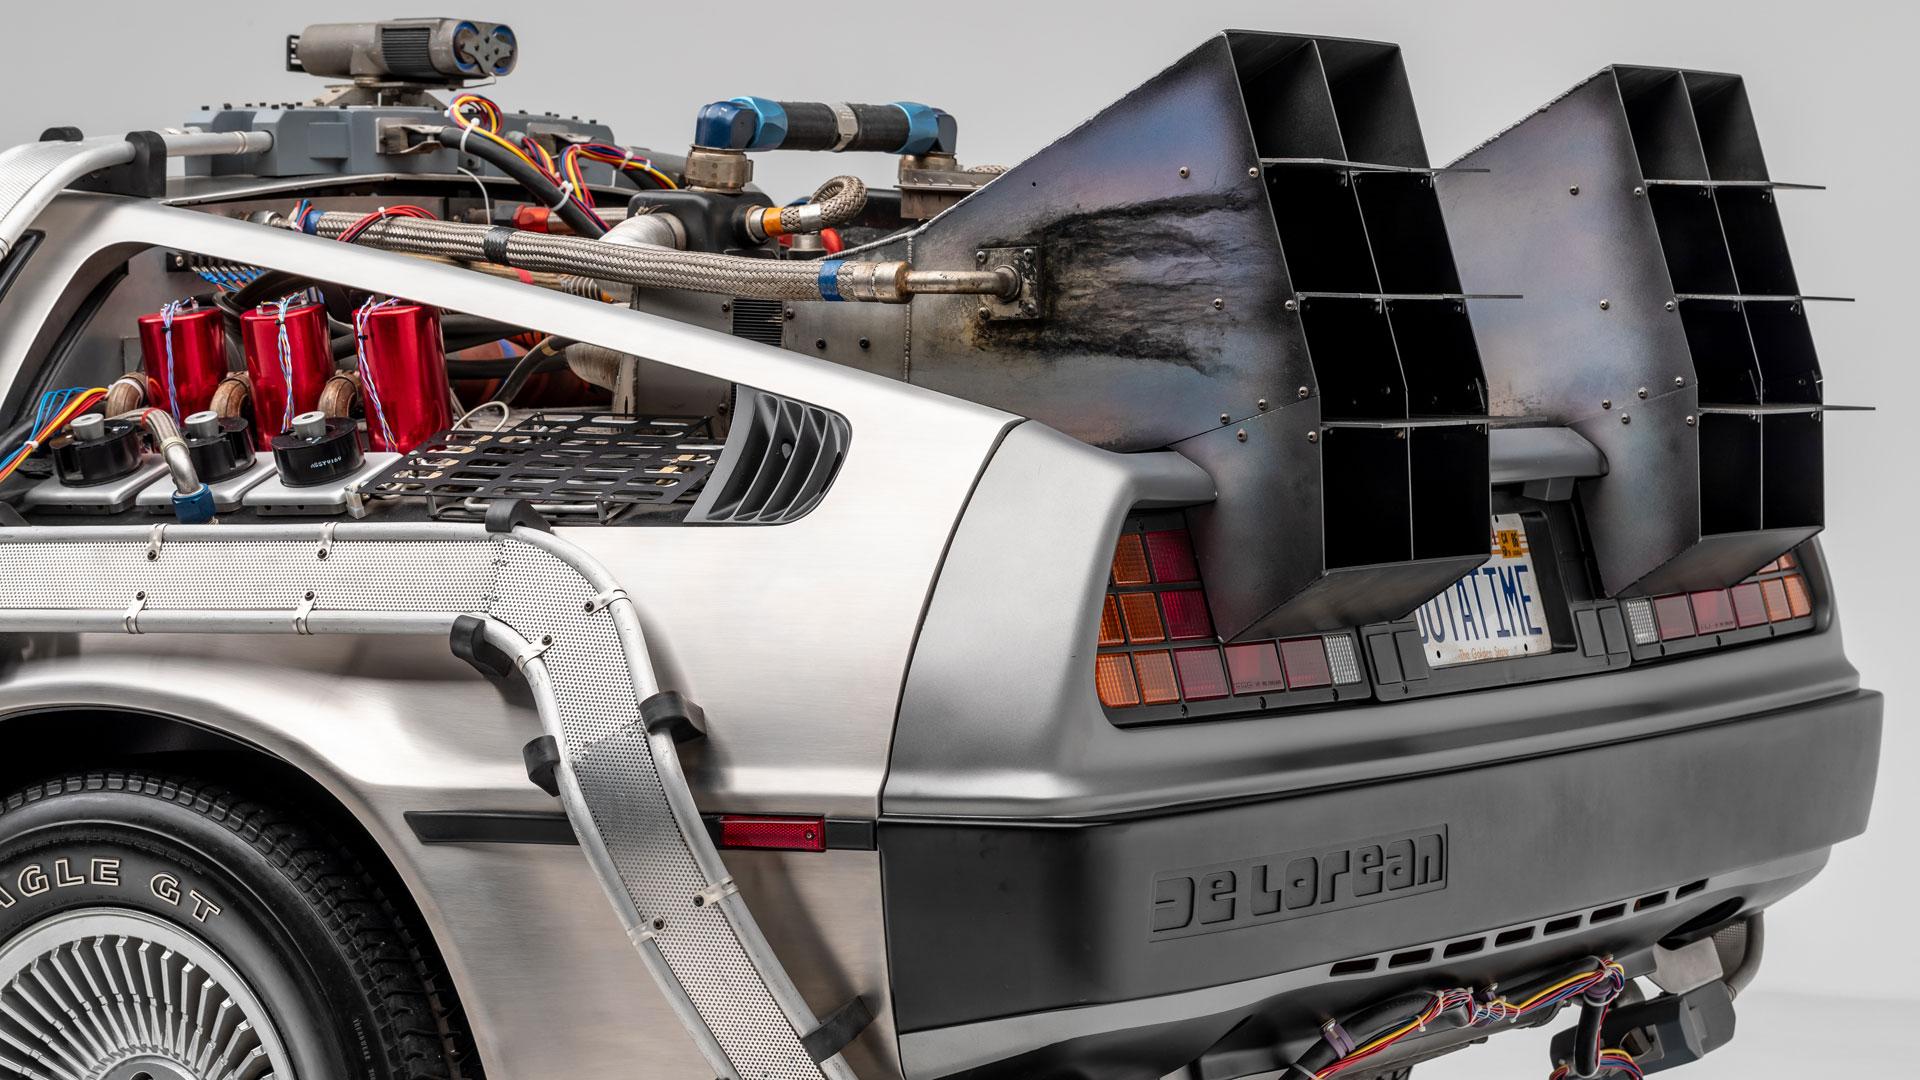 Amazing cars of sci-fi